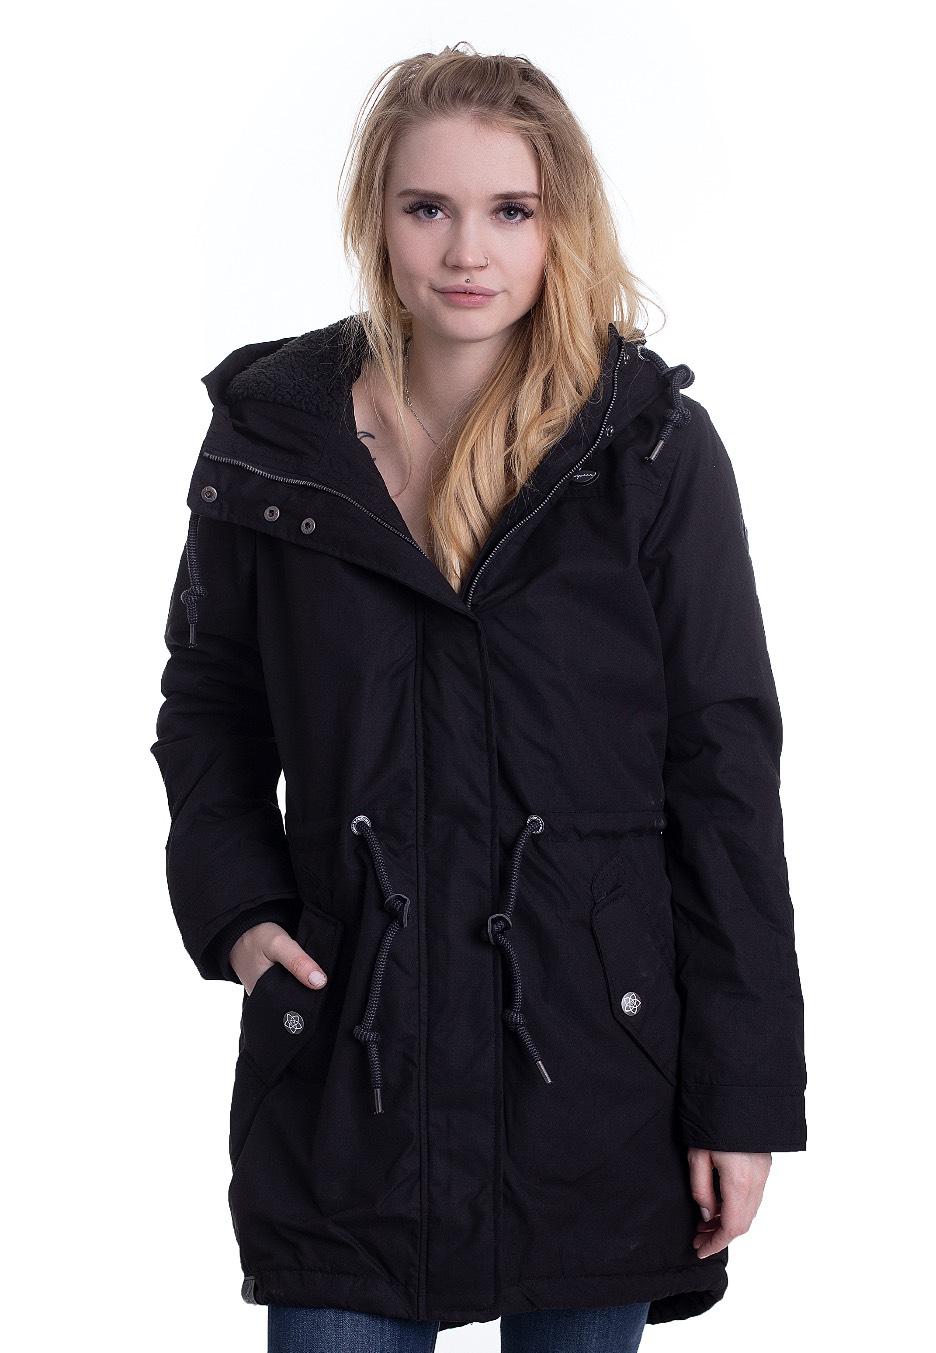 Jacken - Ragwear Elba Coat B Black Jacken  - Onlineshop IMPERICON